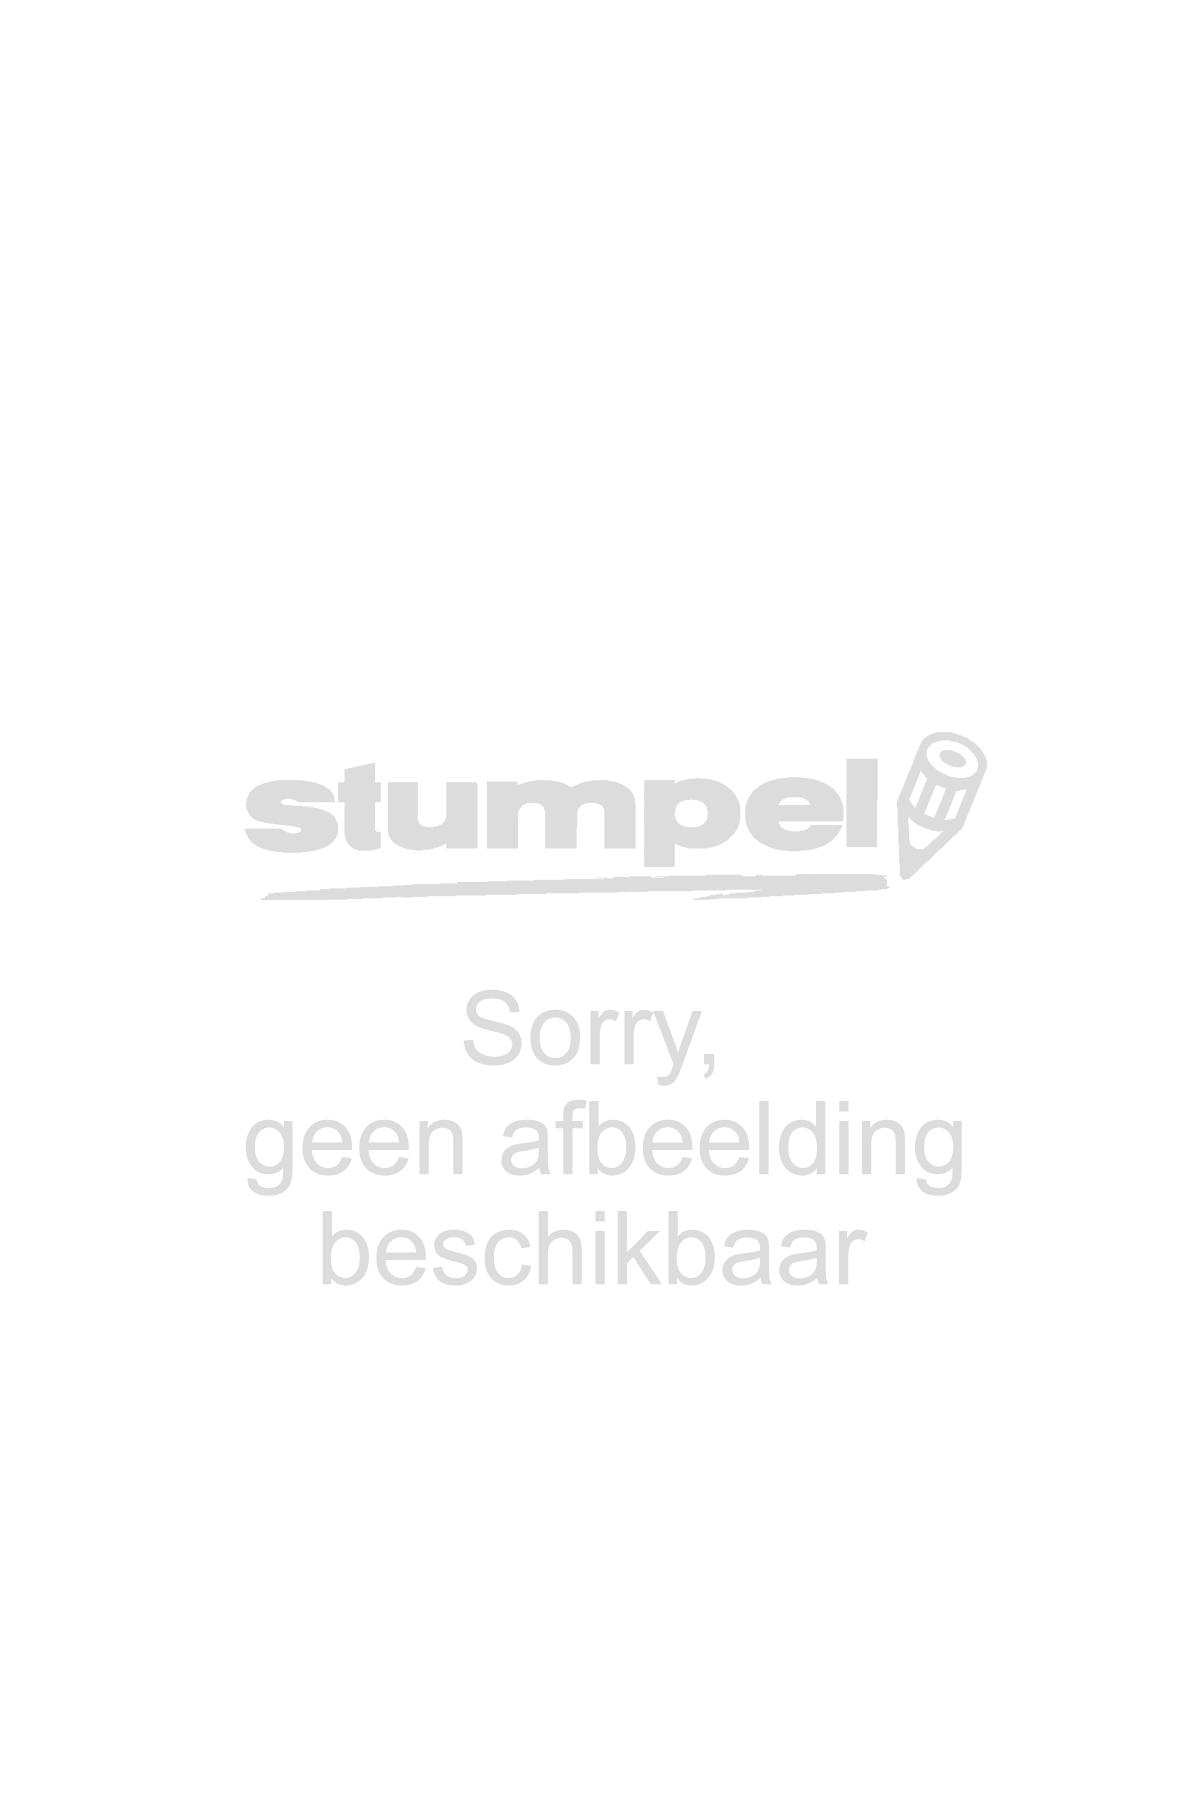 stempelinkt-brother-blauw-20ml-10850035